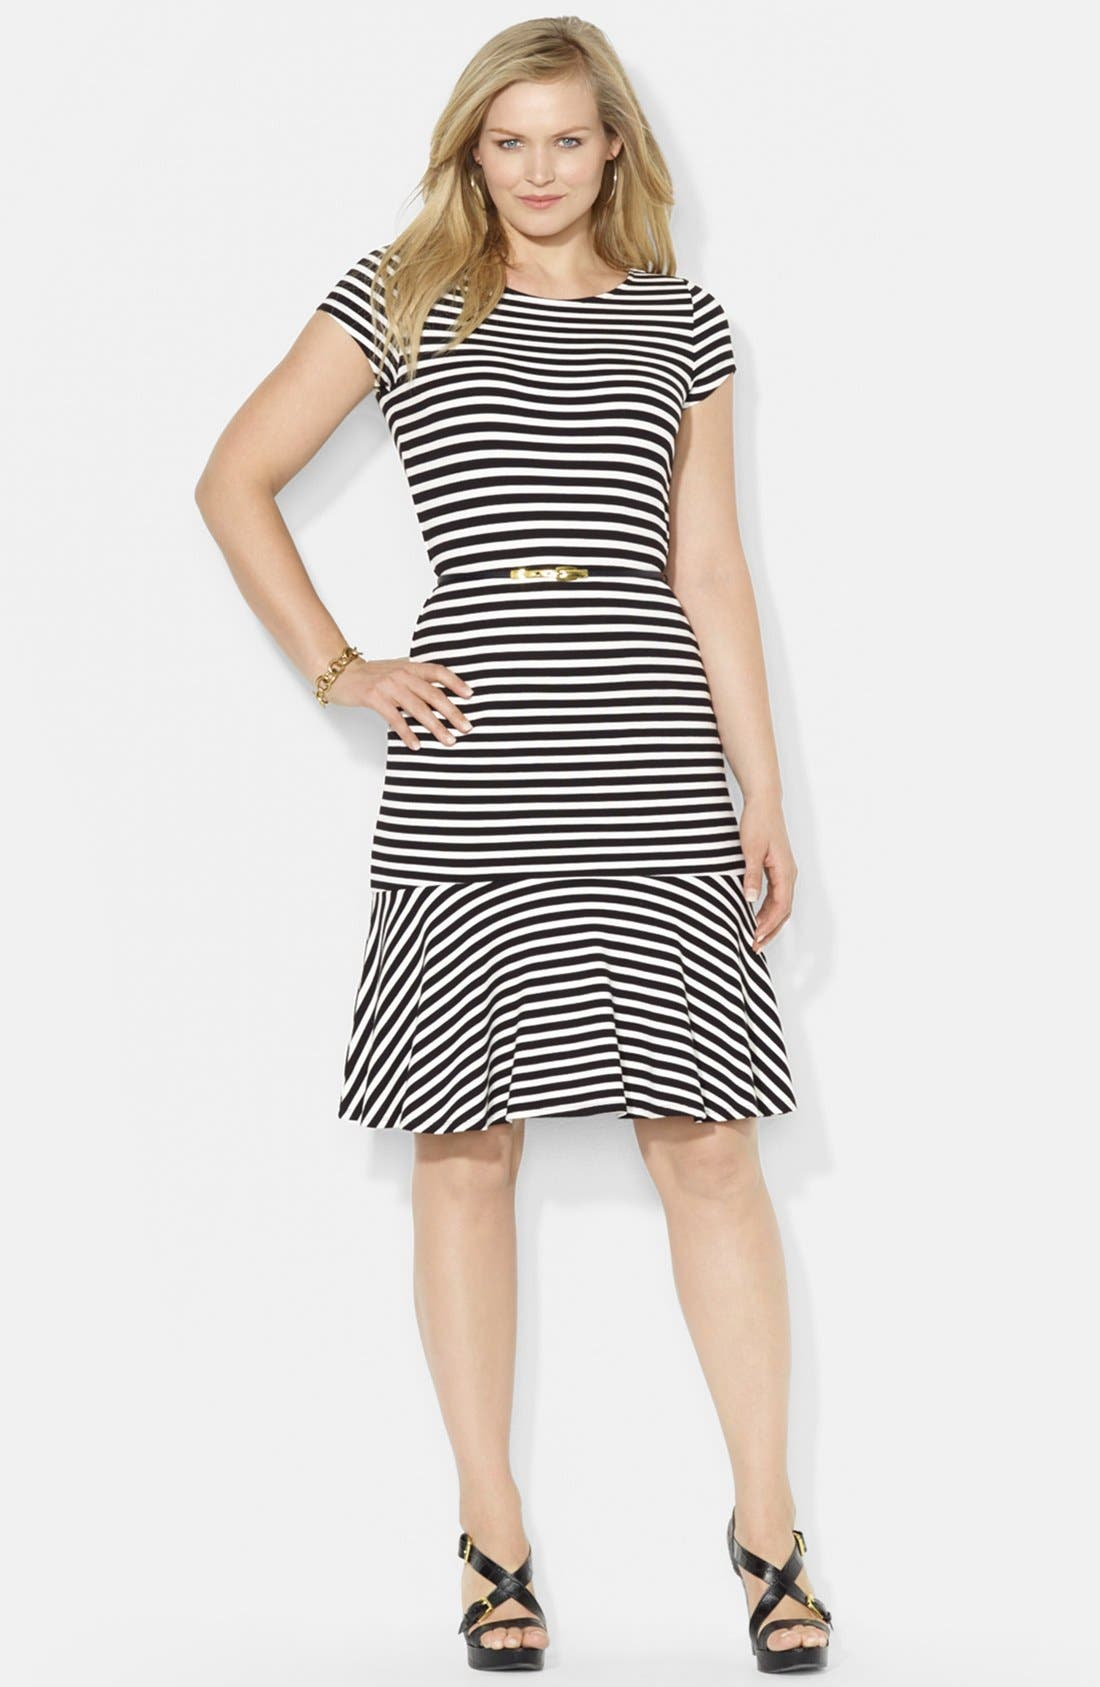 Alternate Image 1 Selected - Lauren Ralph Lauren Belted Stripe Jersey Dress (Plus Size)